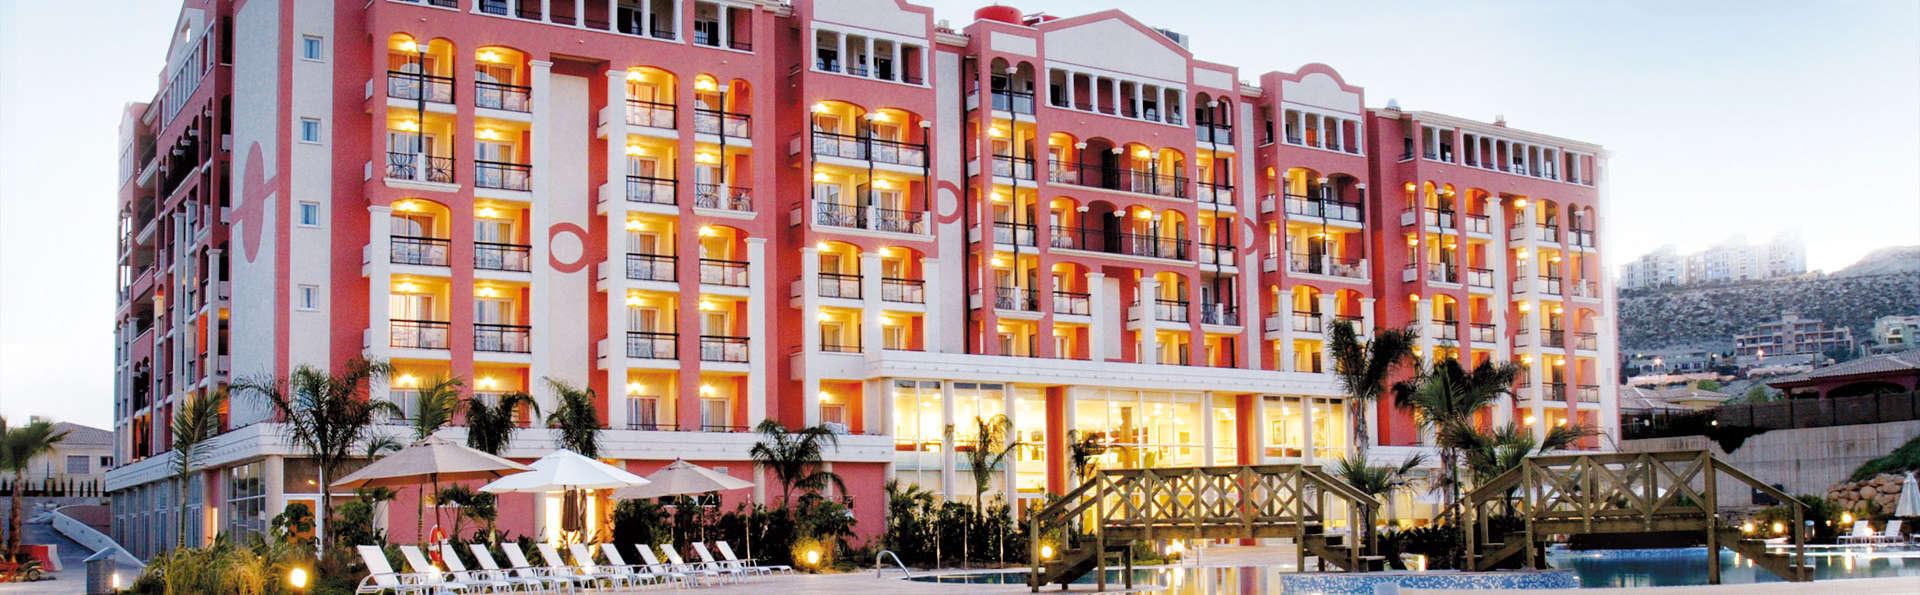 Sercotel Hotel Bonalba Alicante - edit_front312.jpg